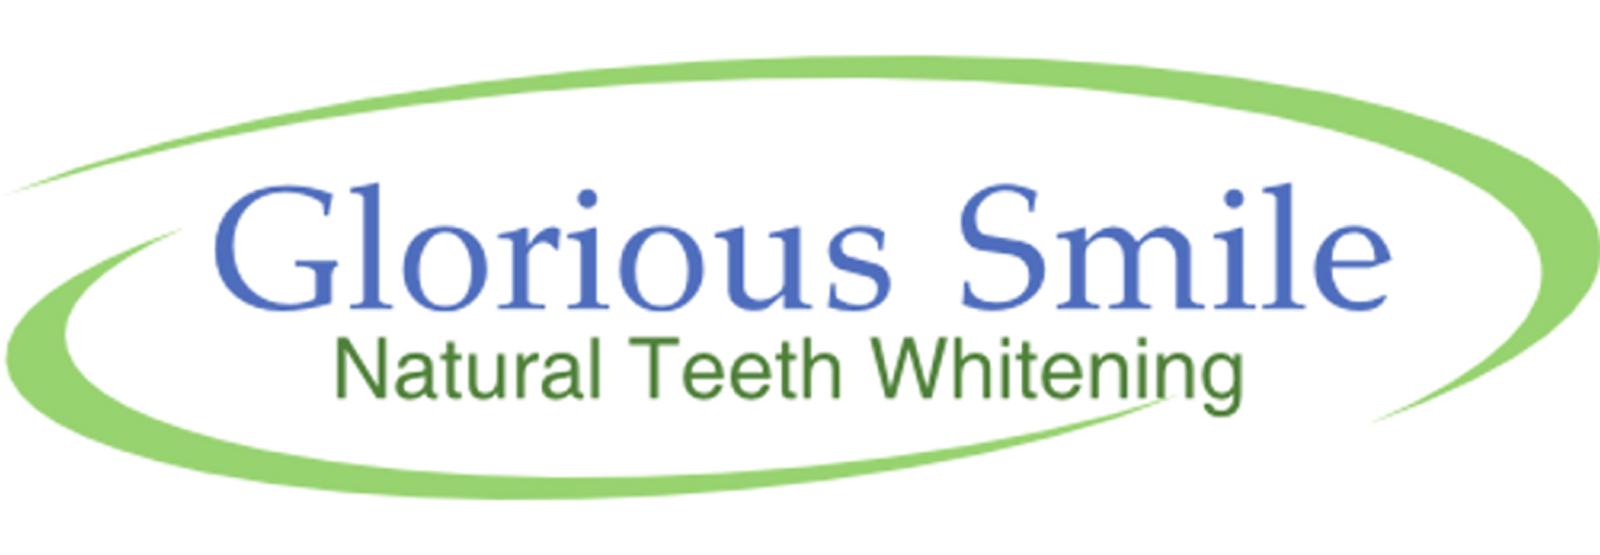 Glorious Smile Natural Teeth Whitening